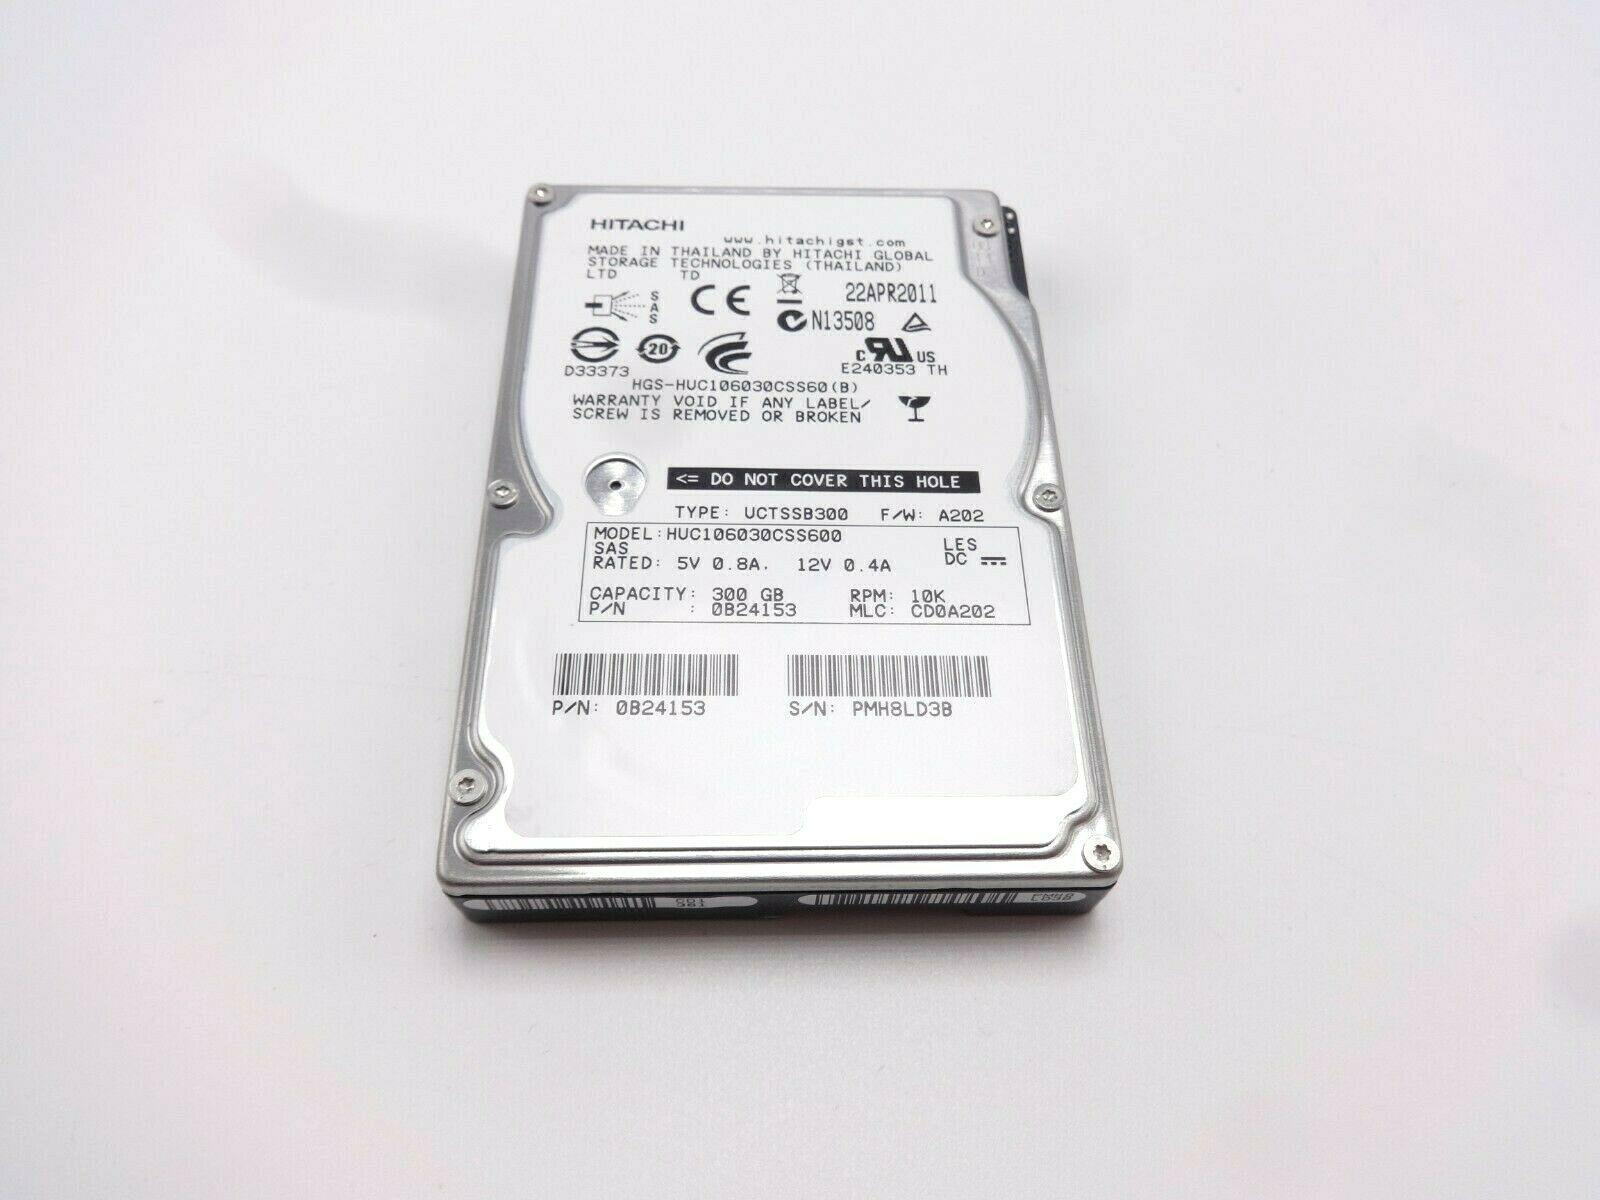 Hitachi 300Gb 10K 6Gbps SAS 2.5 Hard Drive